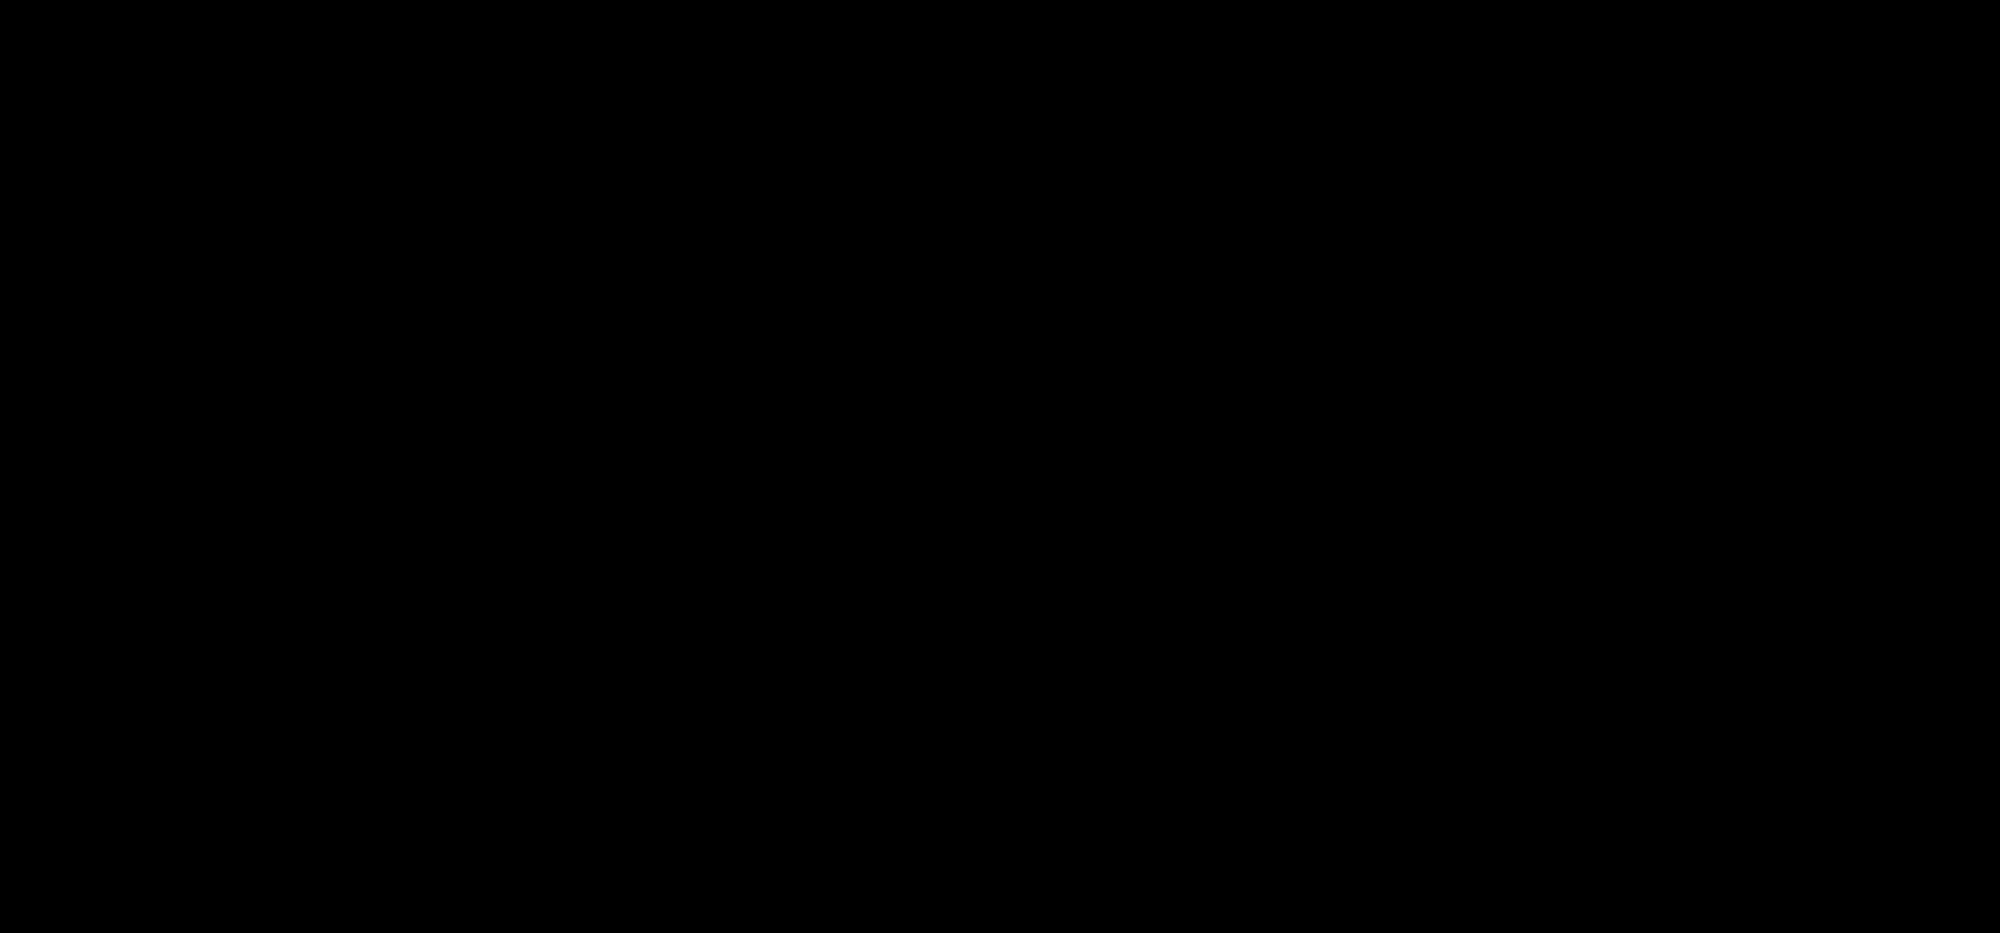 2000x933 Fileturtle.svg